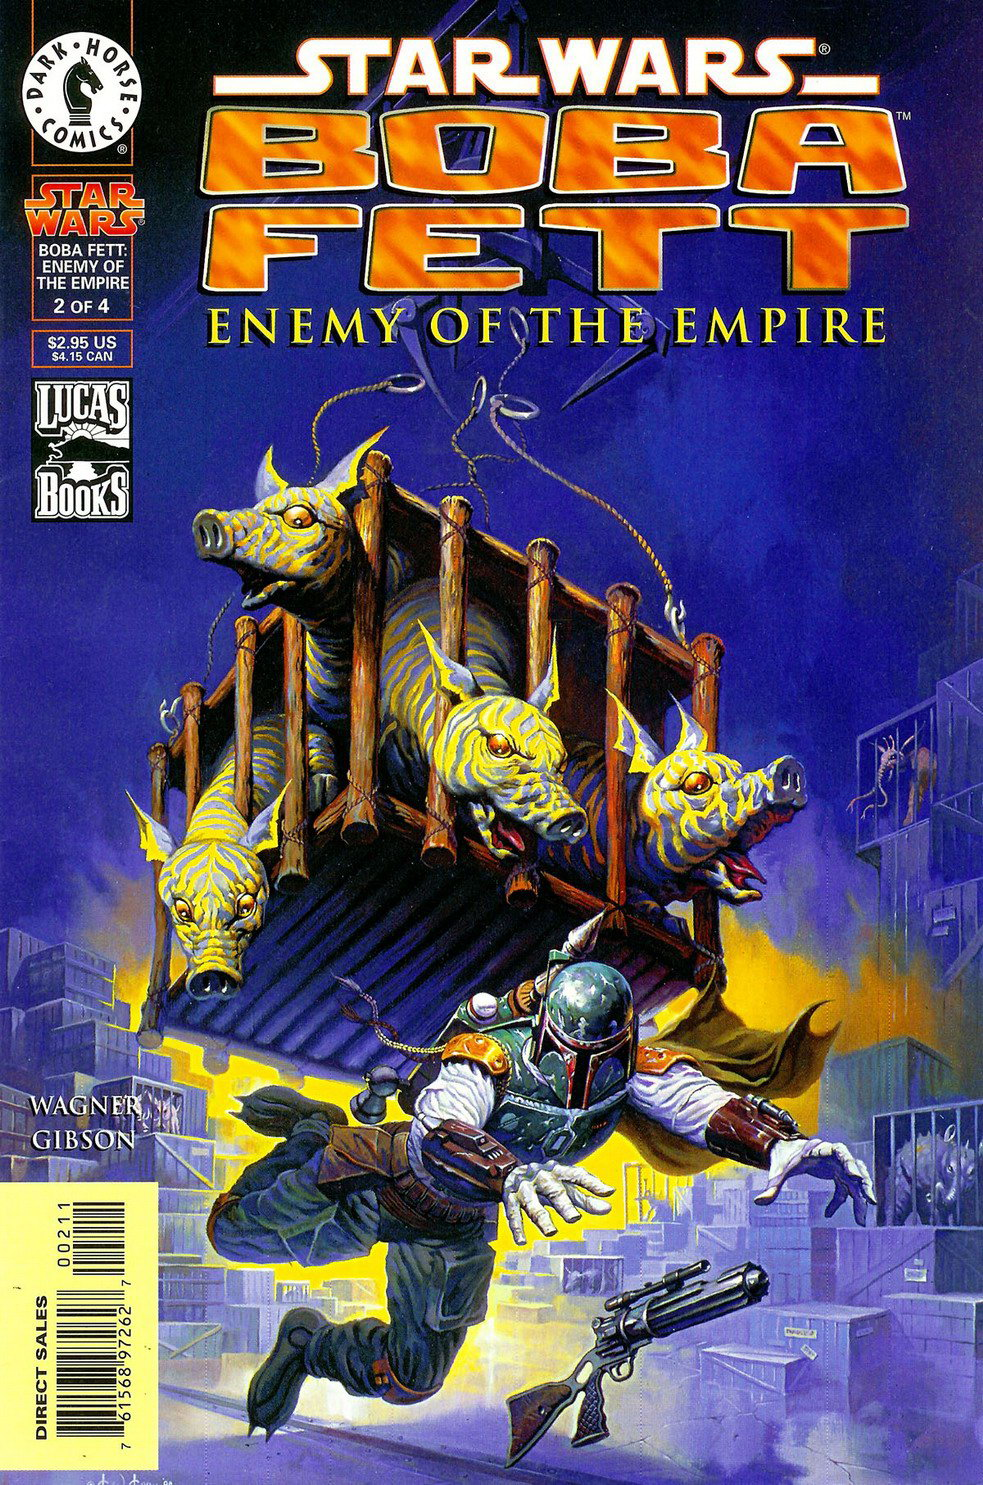 Star Wars Boba Fett: Enemy of the Empire 2